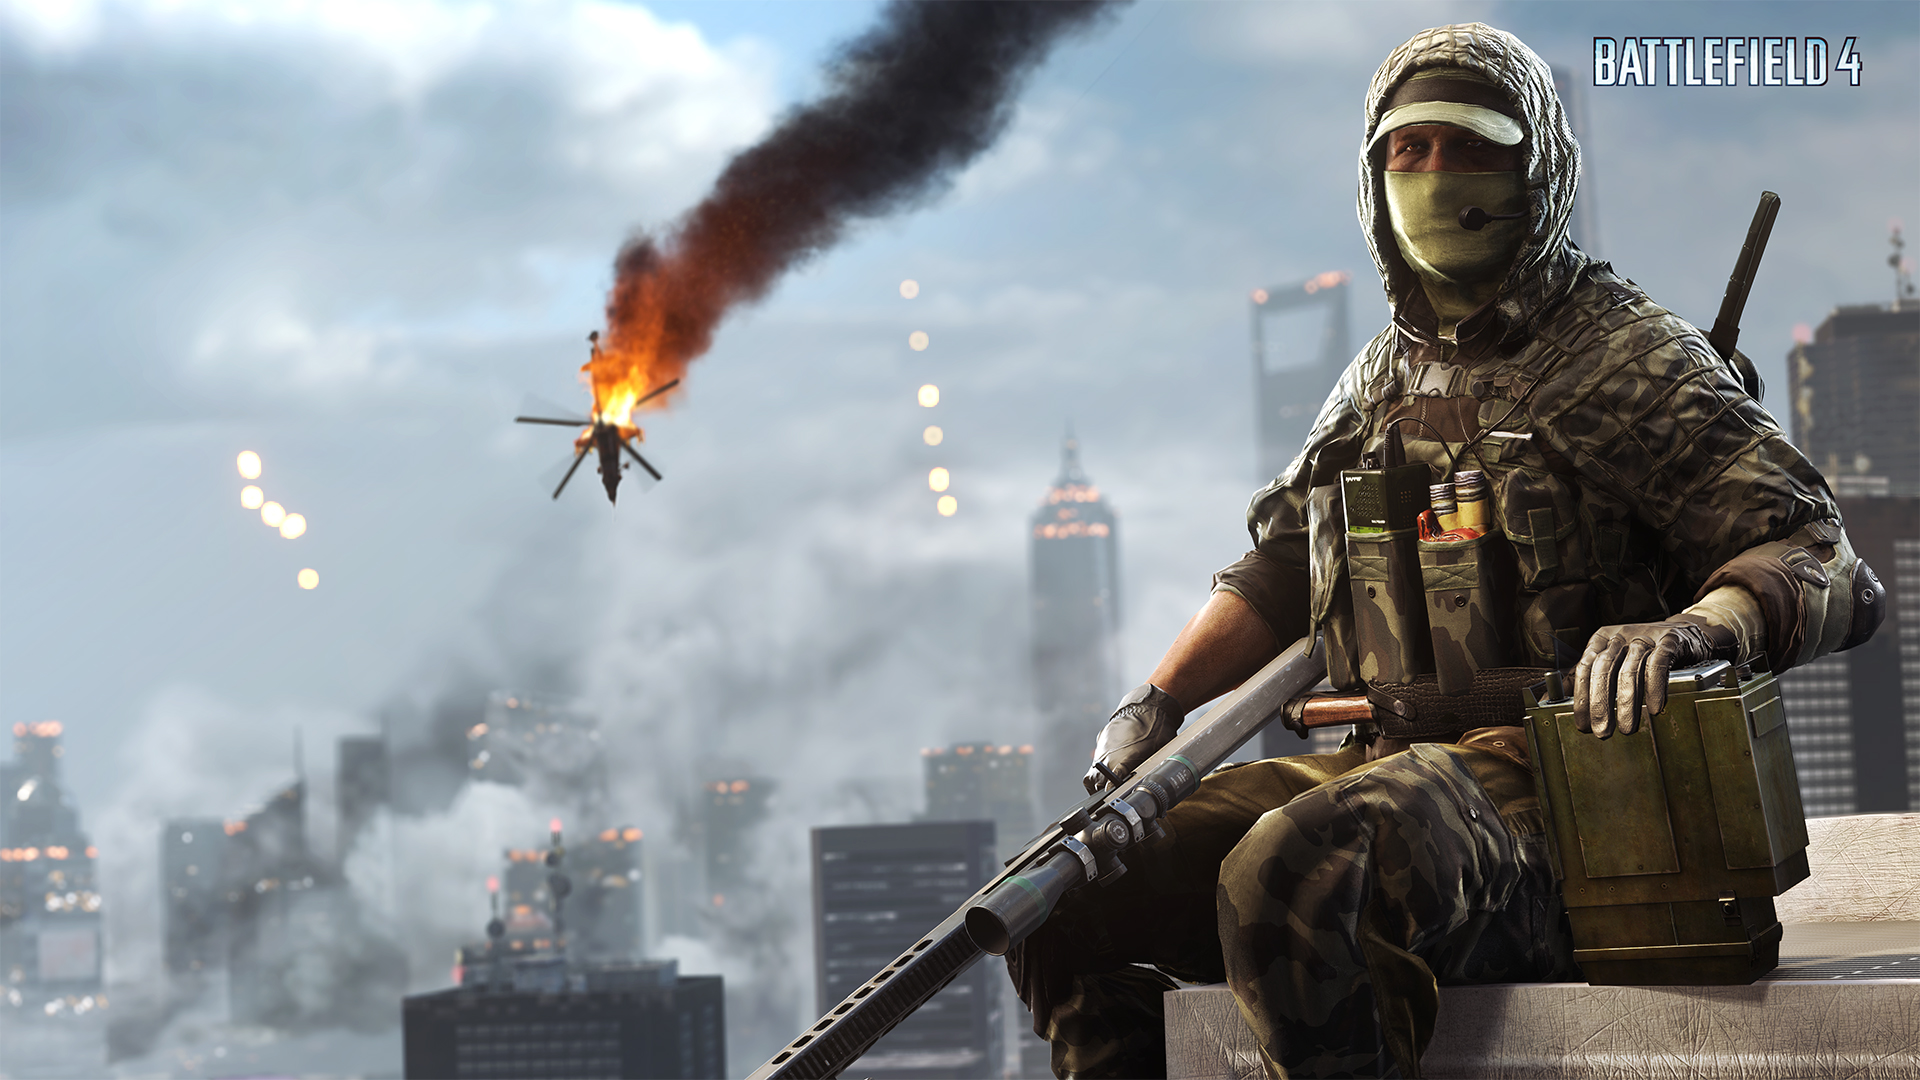 44 Battlefield 4 Wallpaper On Wallpapersafari